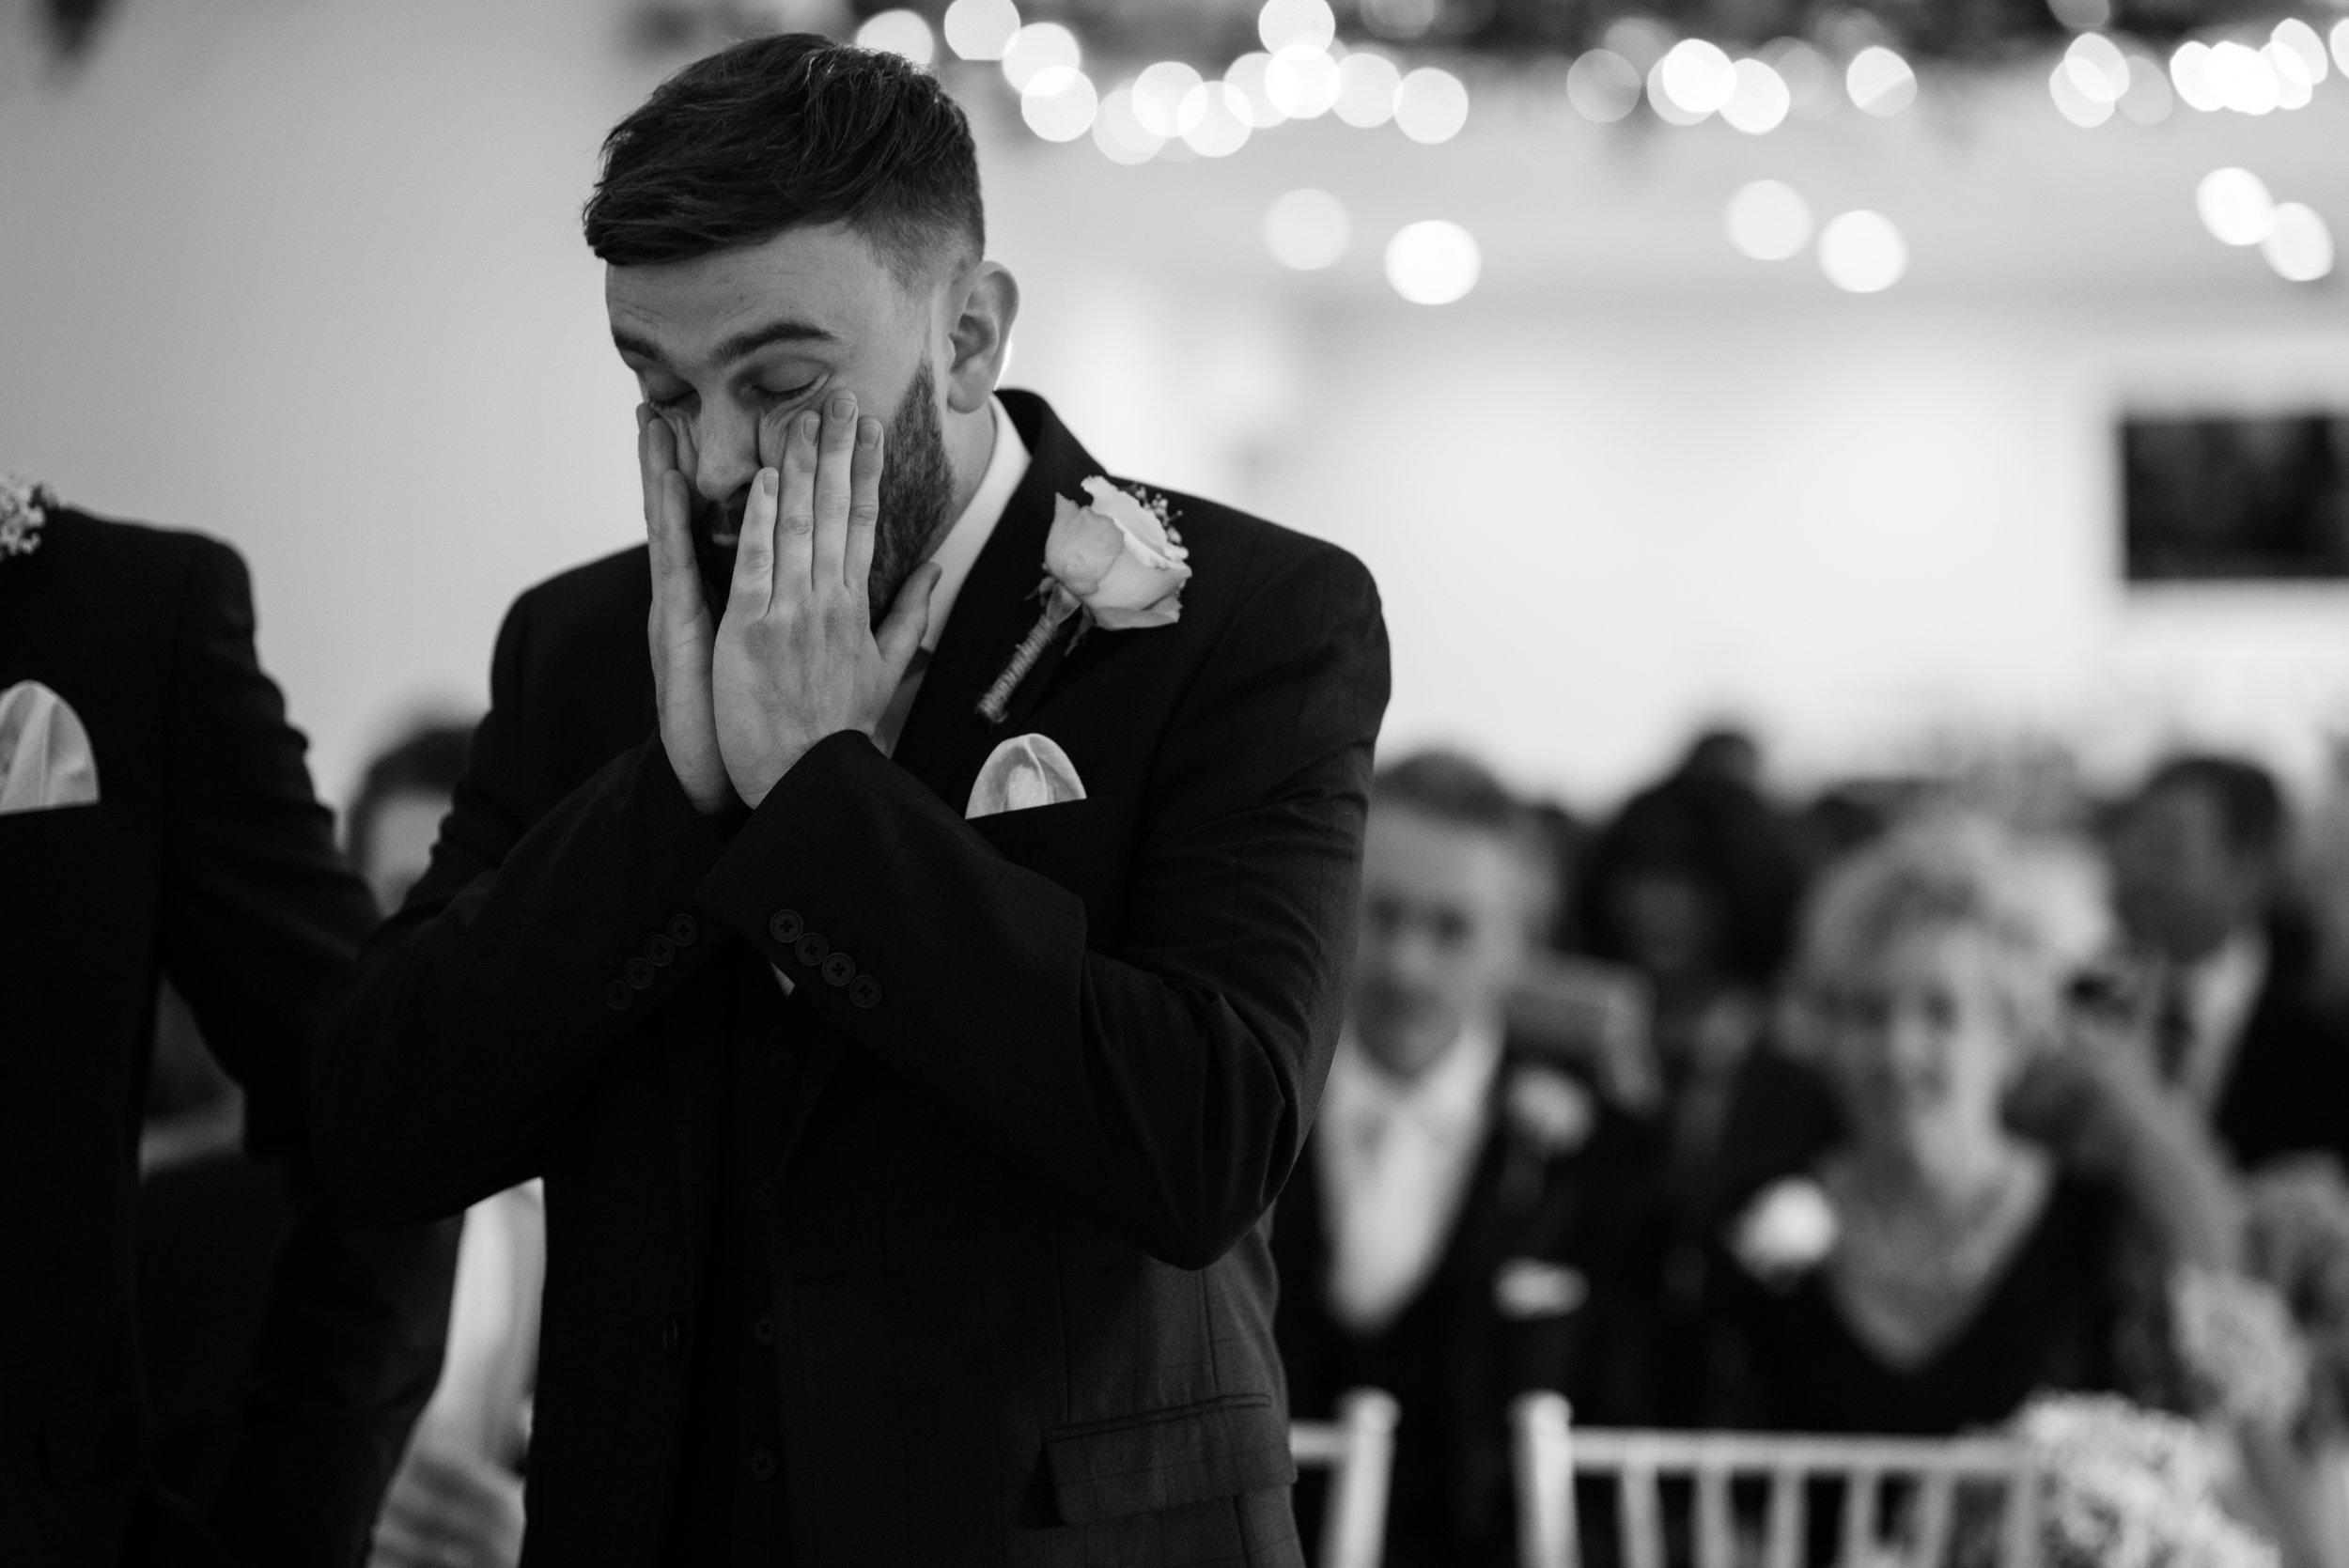 london-hertfordshire-wedding-photography-milling-barn-ceremony-31